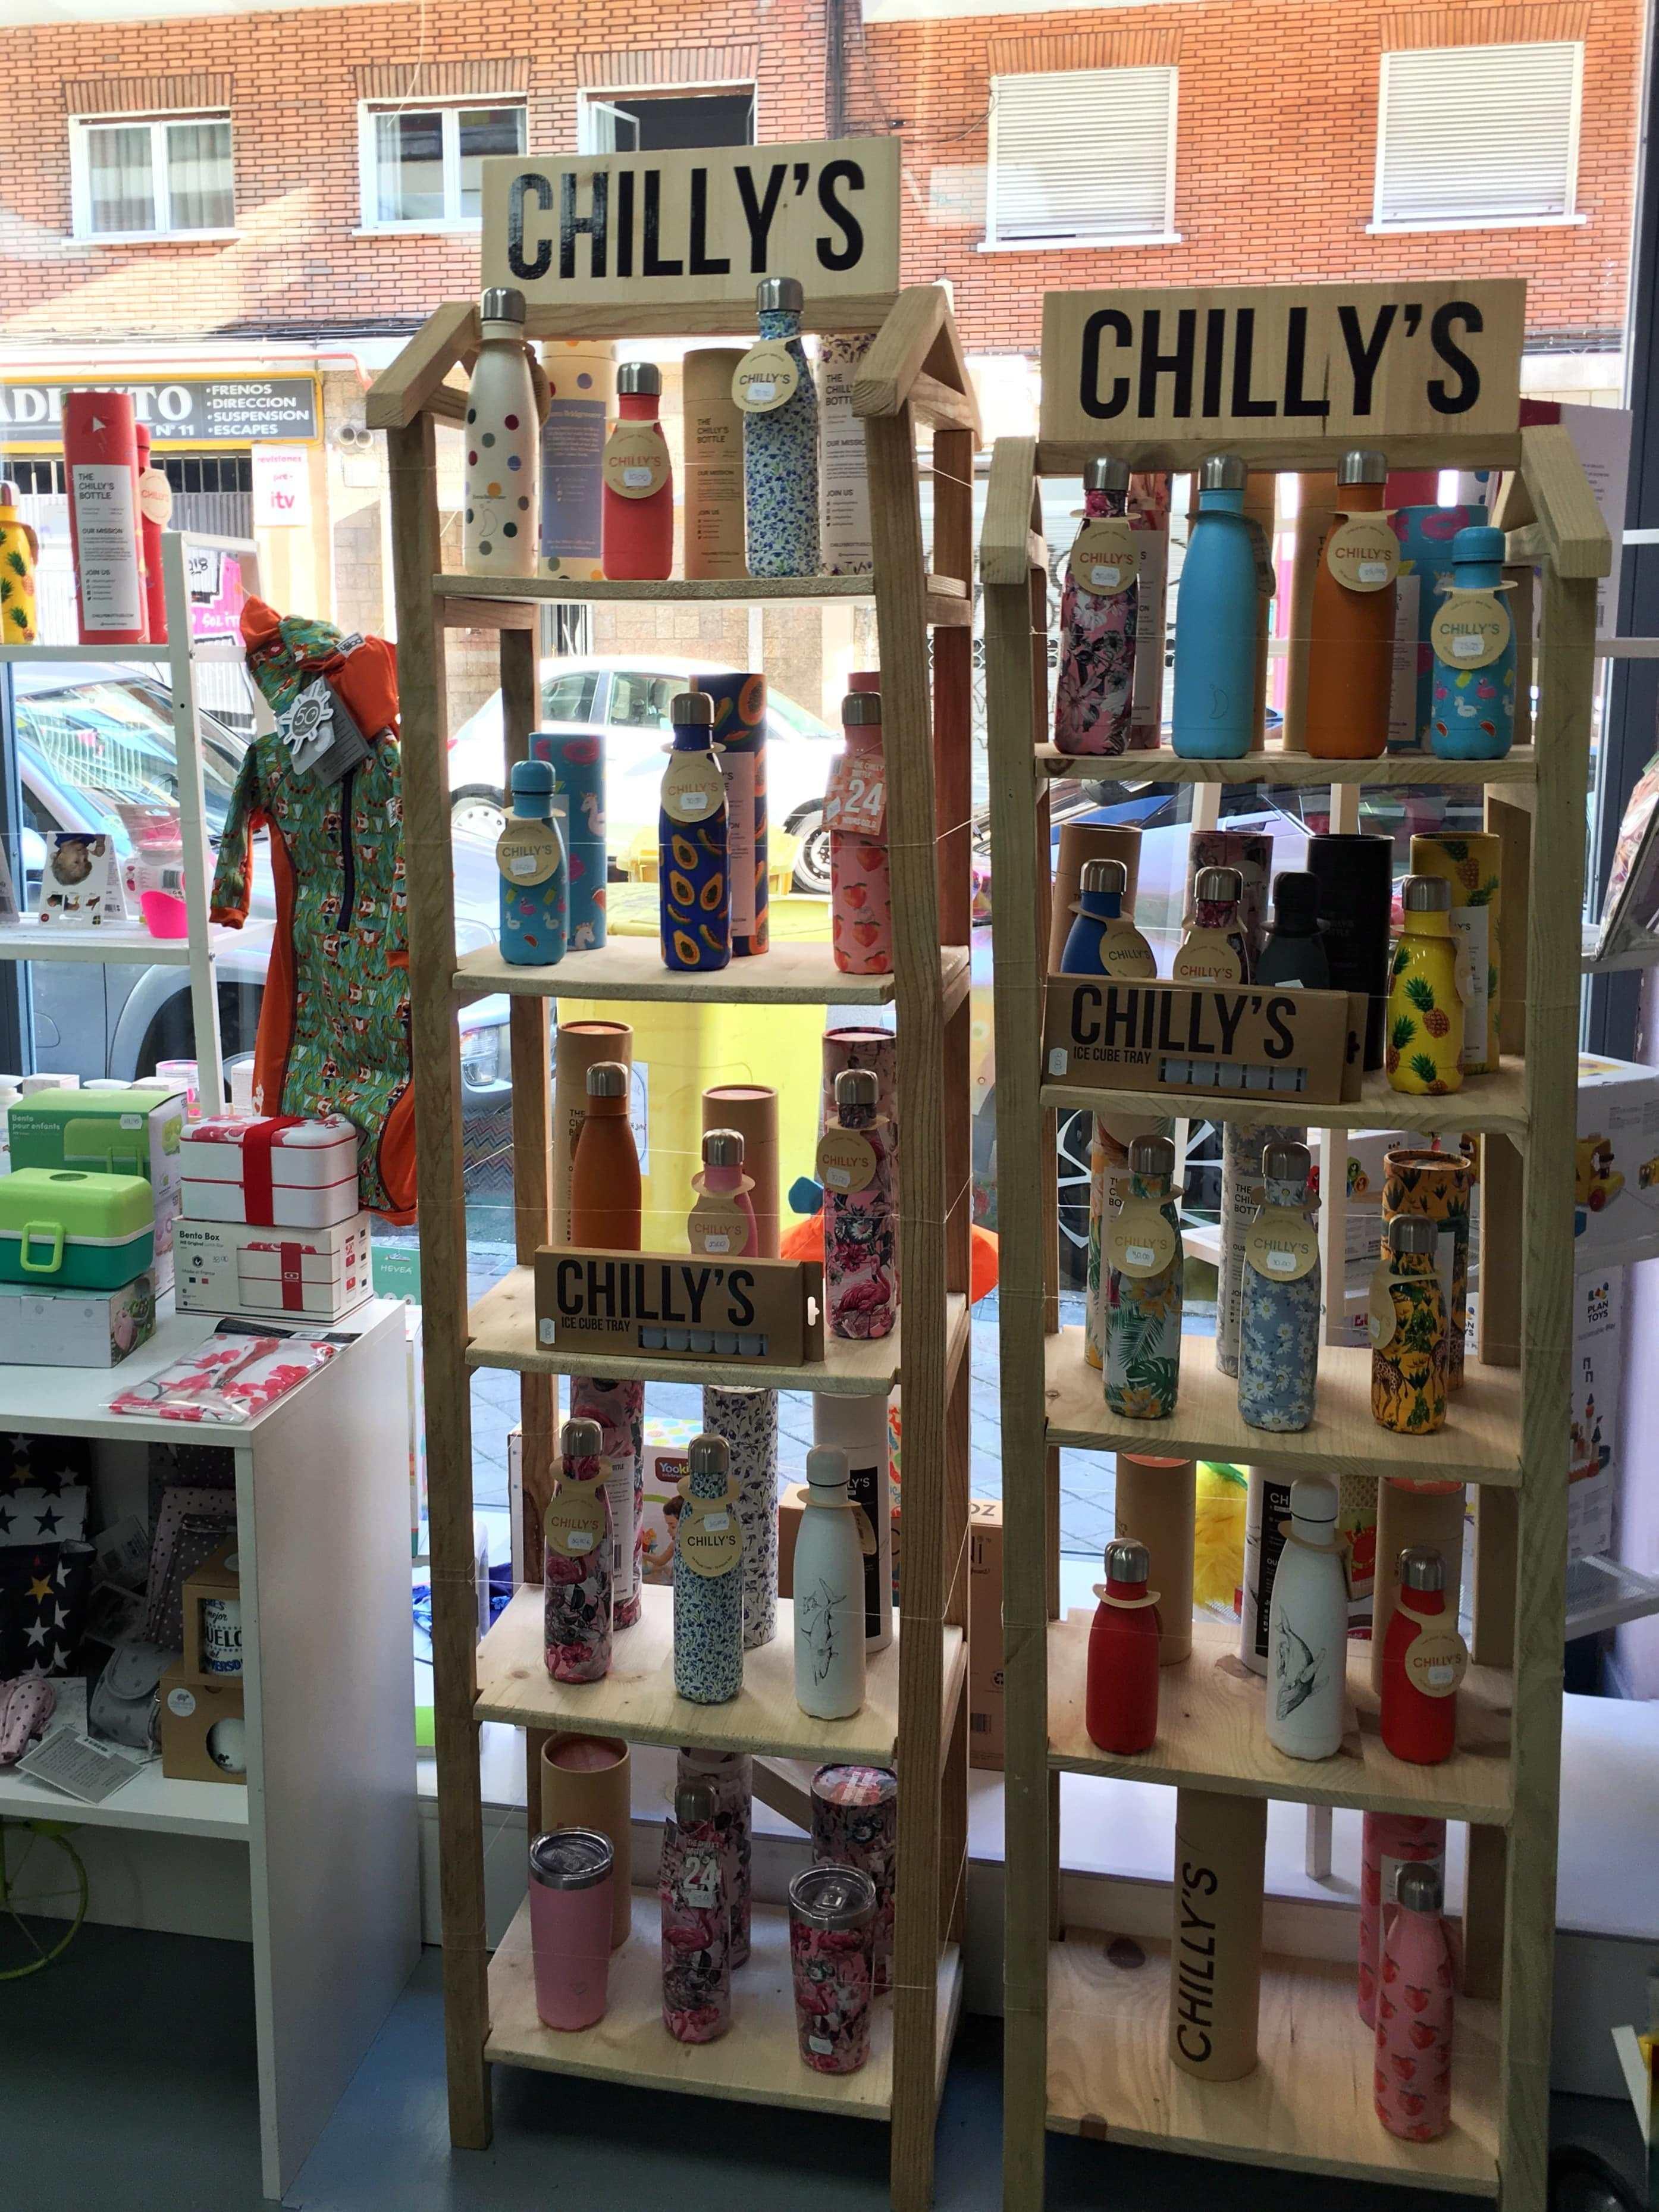 comprar botellas chillys tienda madrid